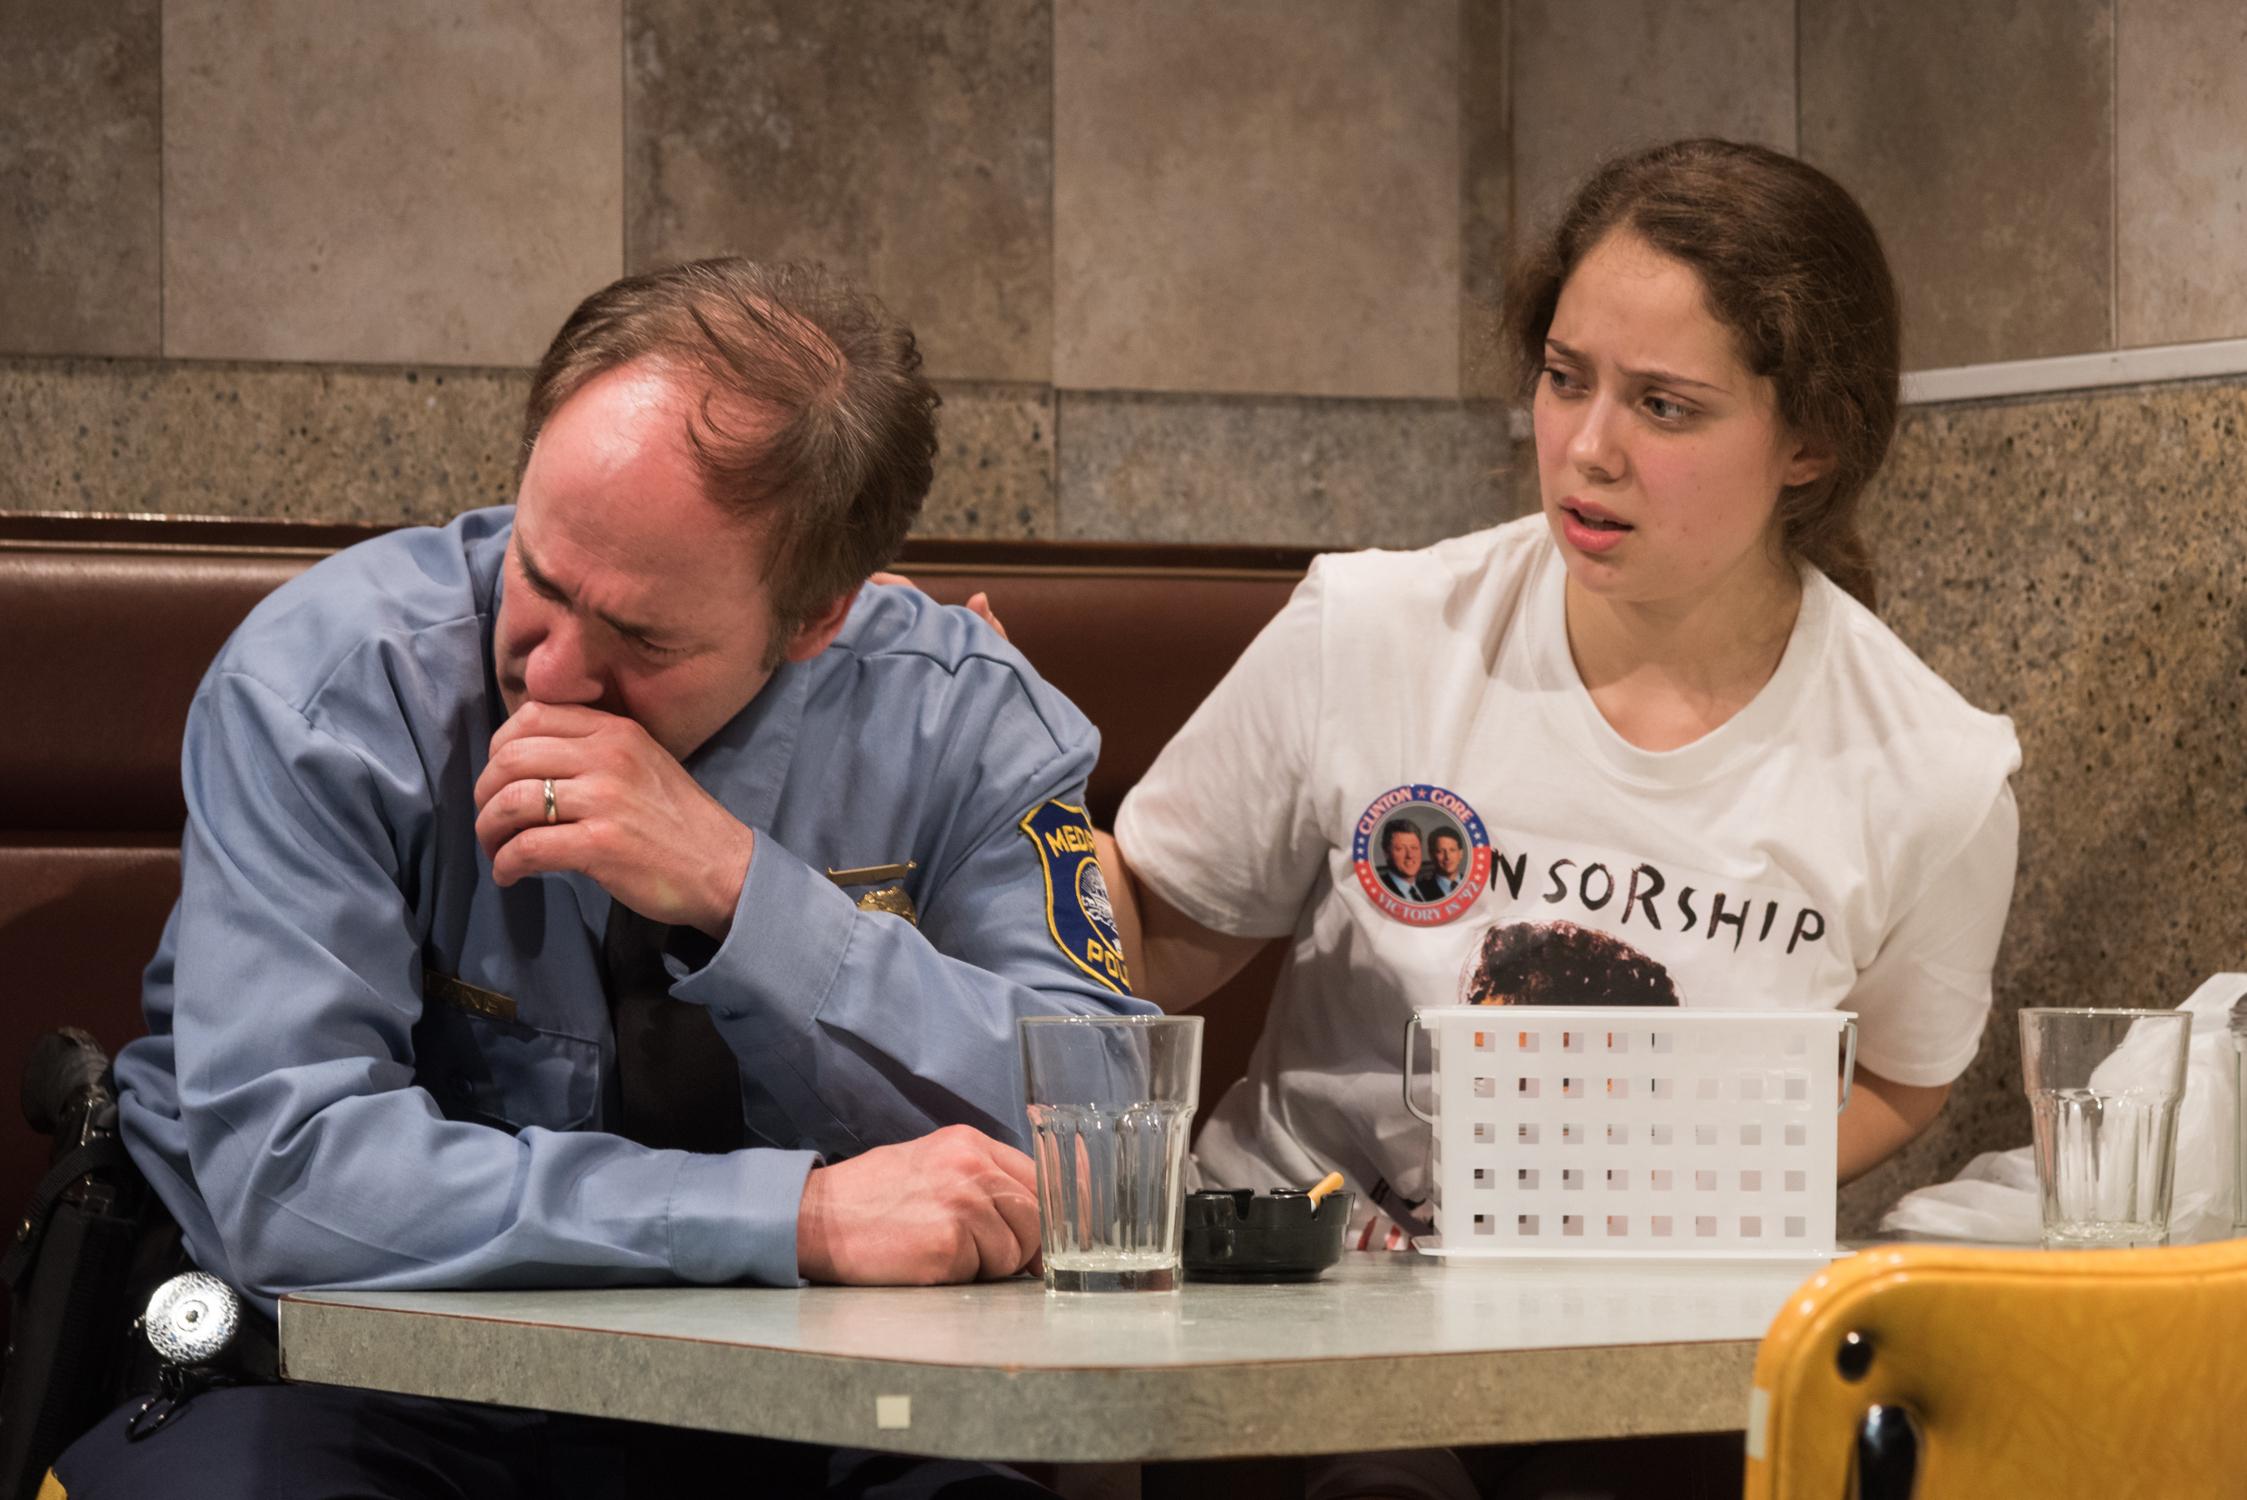 Matthew Lawler as Officer Dan, Rachel Franco as Tara. Photo credit: Russ Rowland